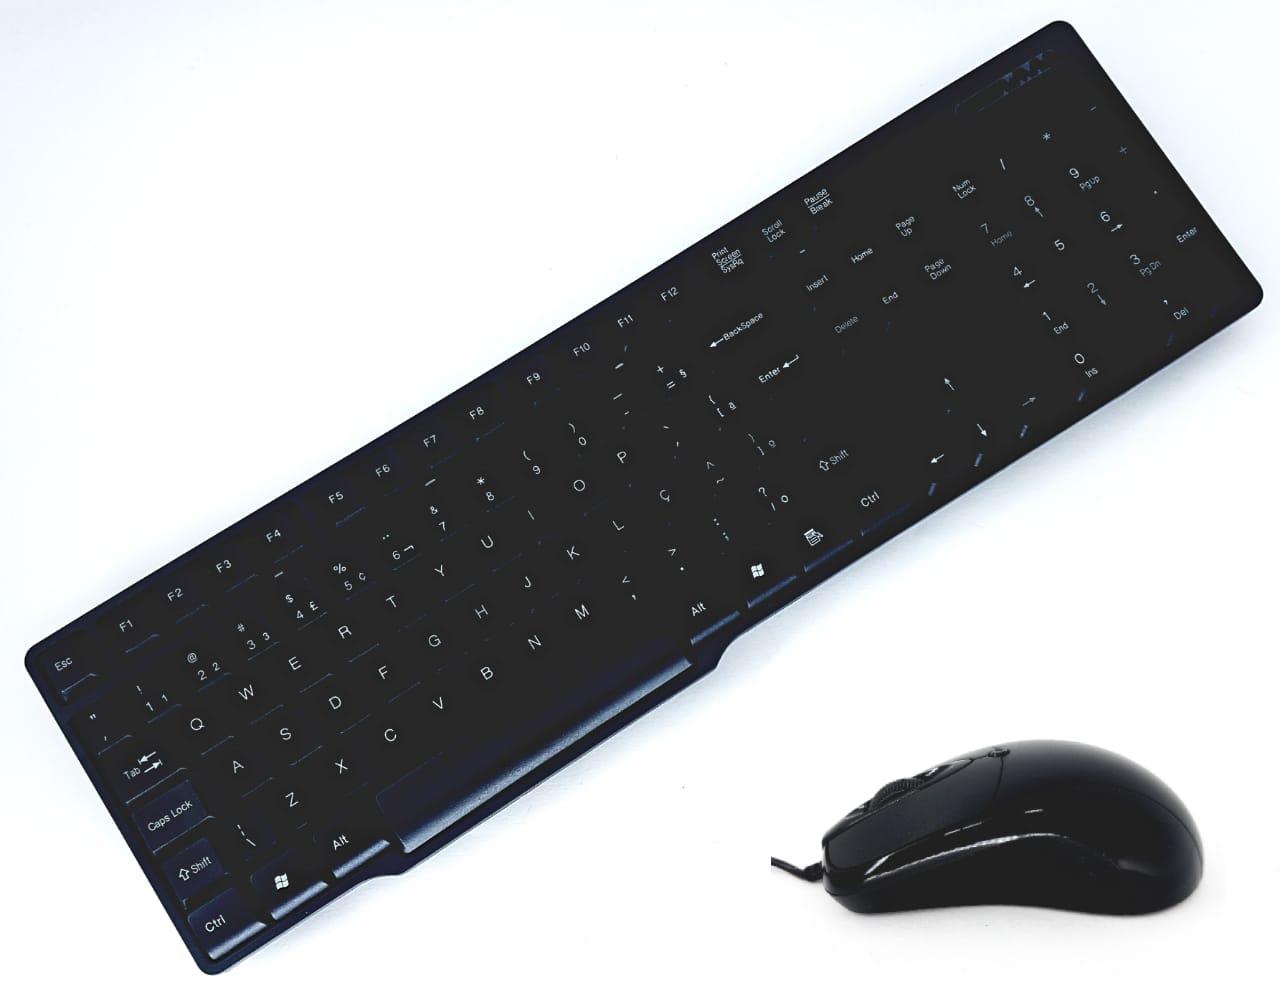 Kit teclado abnt2 e mouse optico usb preto novo